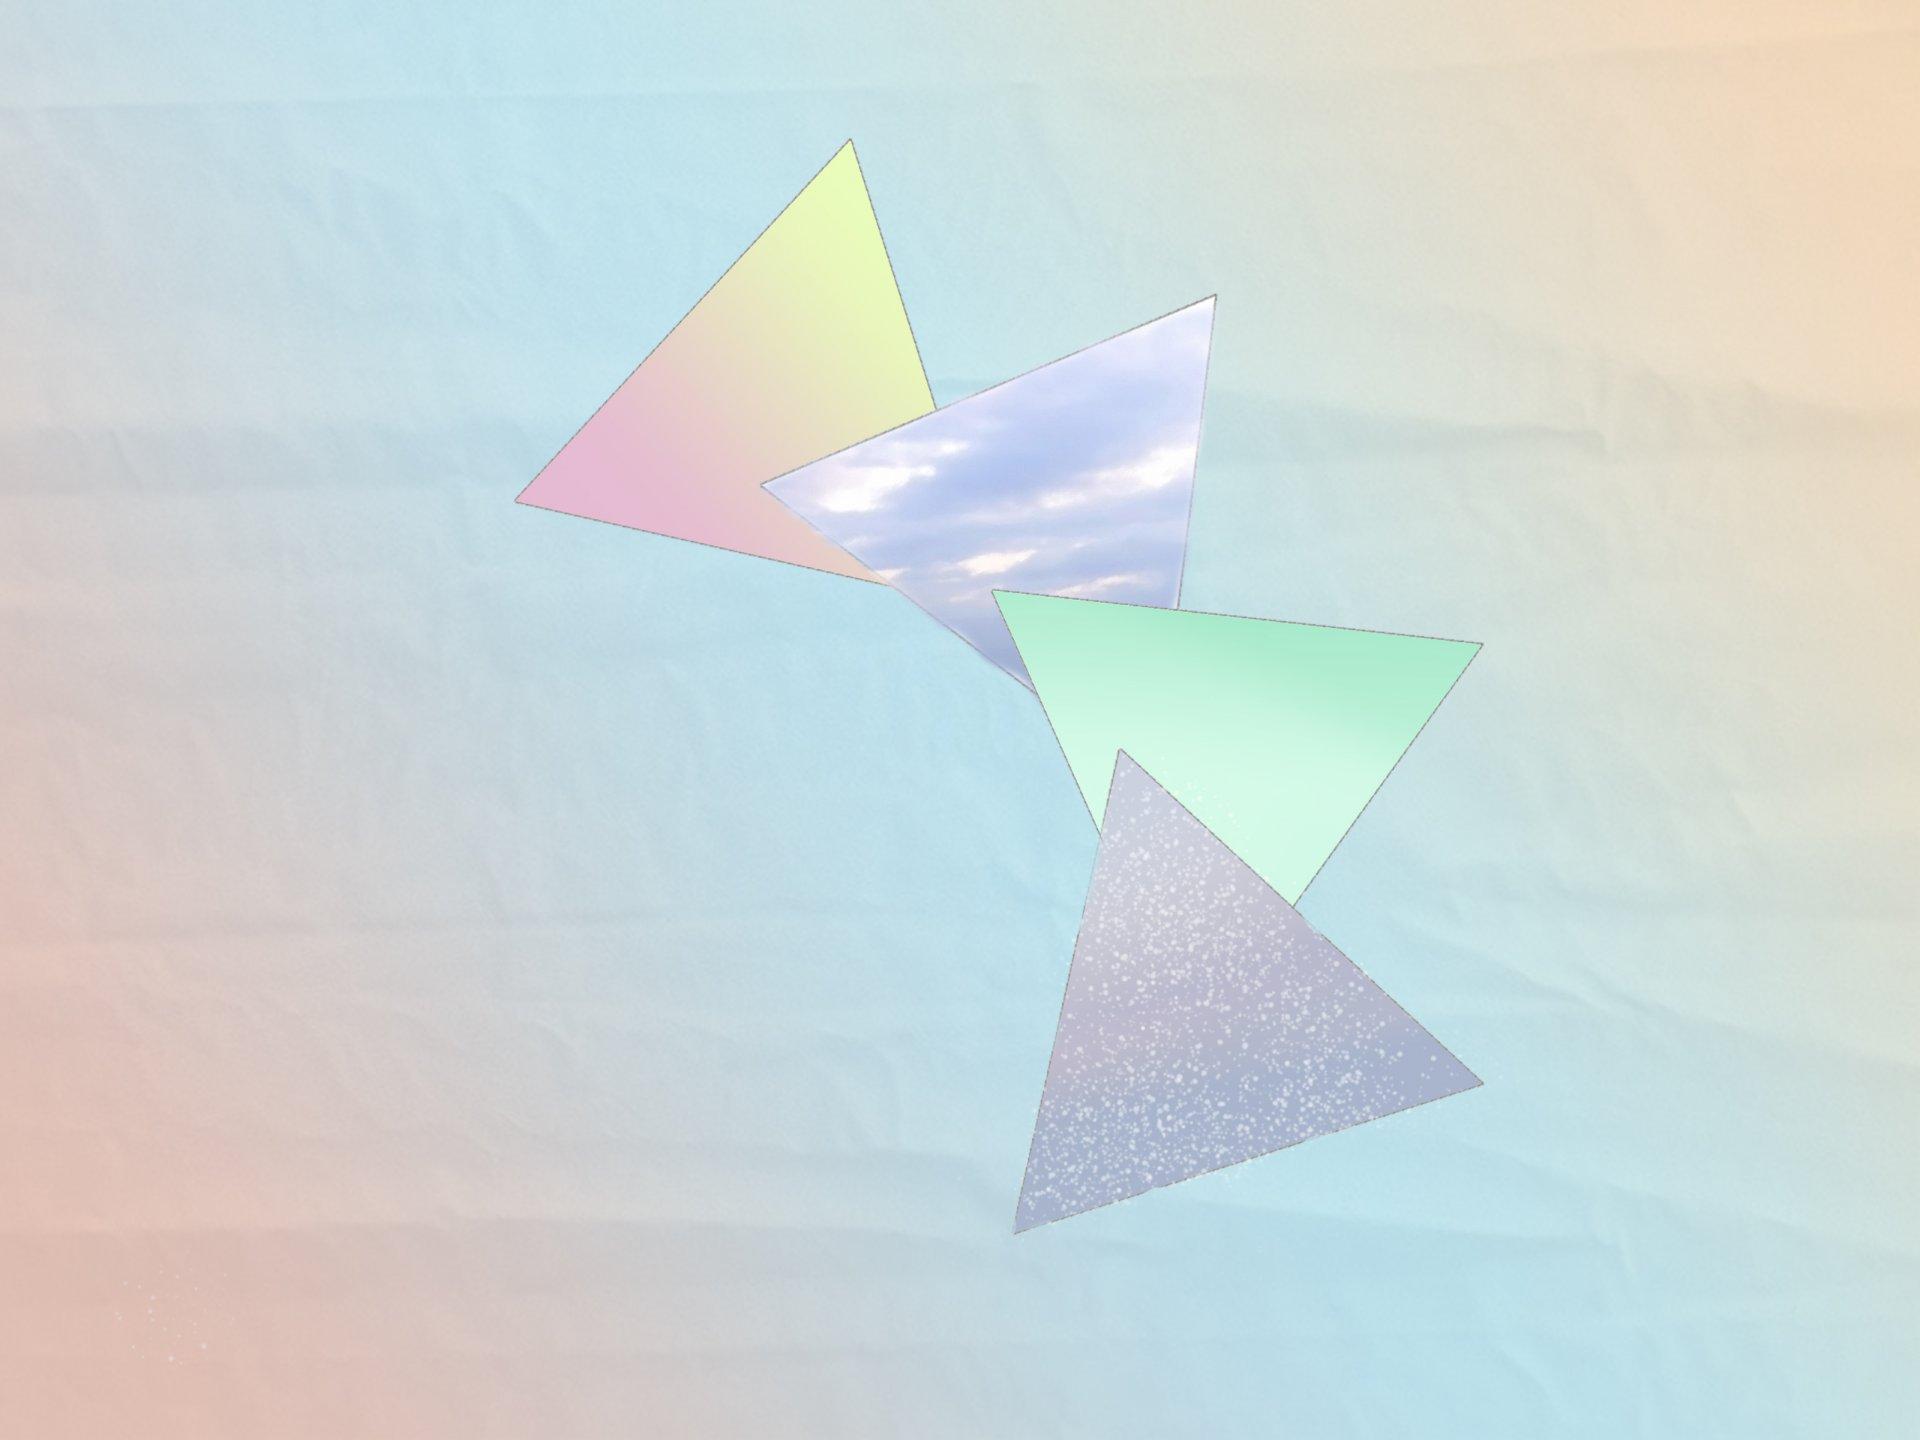 Картинка для презентации по геометрии